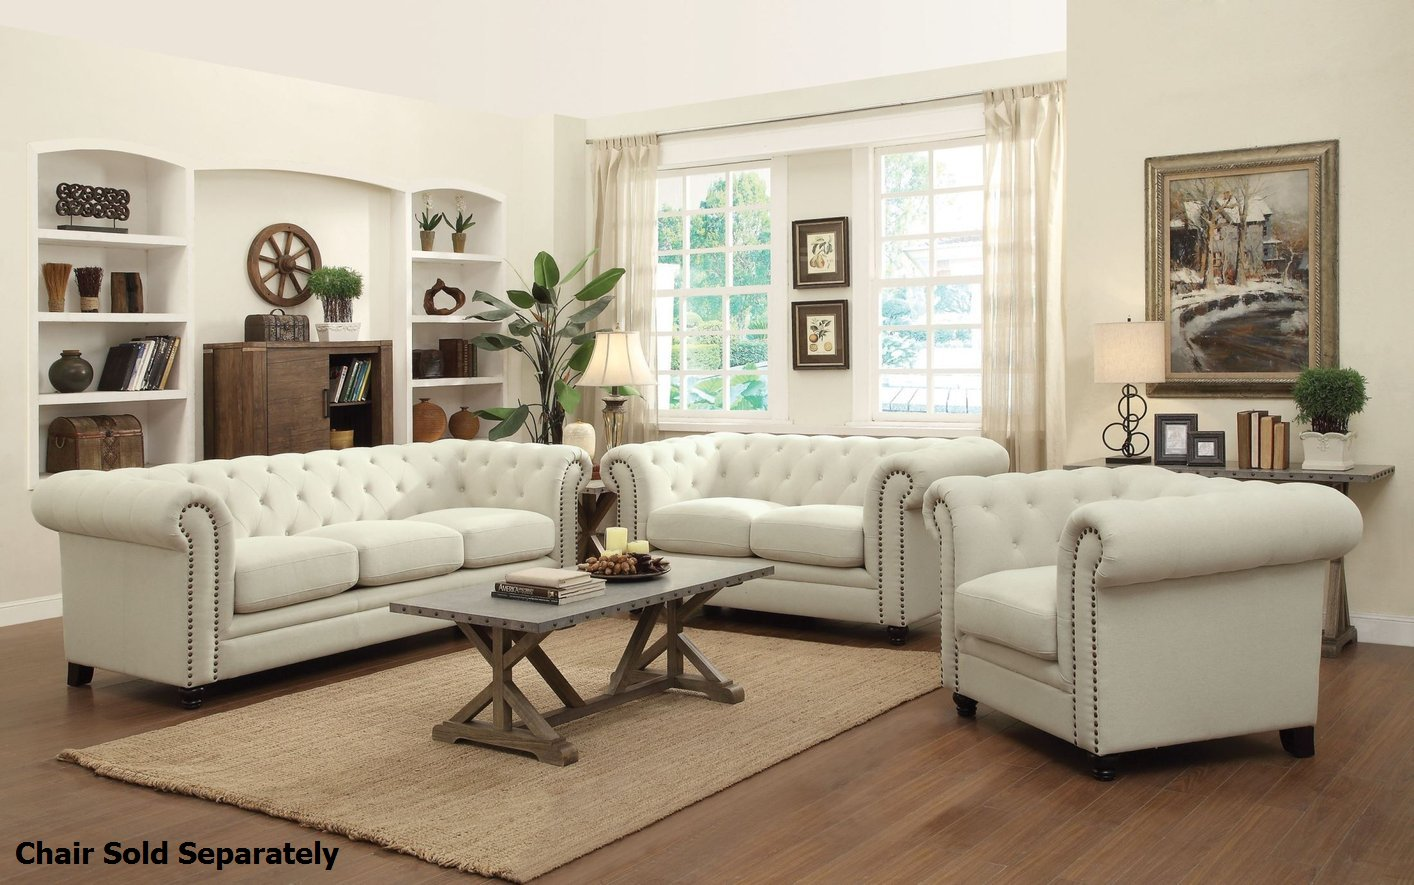 Sofa loveseat roy beige fabric sofa and loveseat set XNYBOWQ